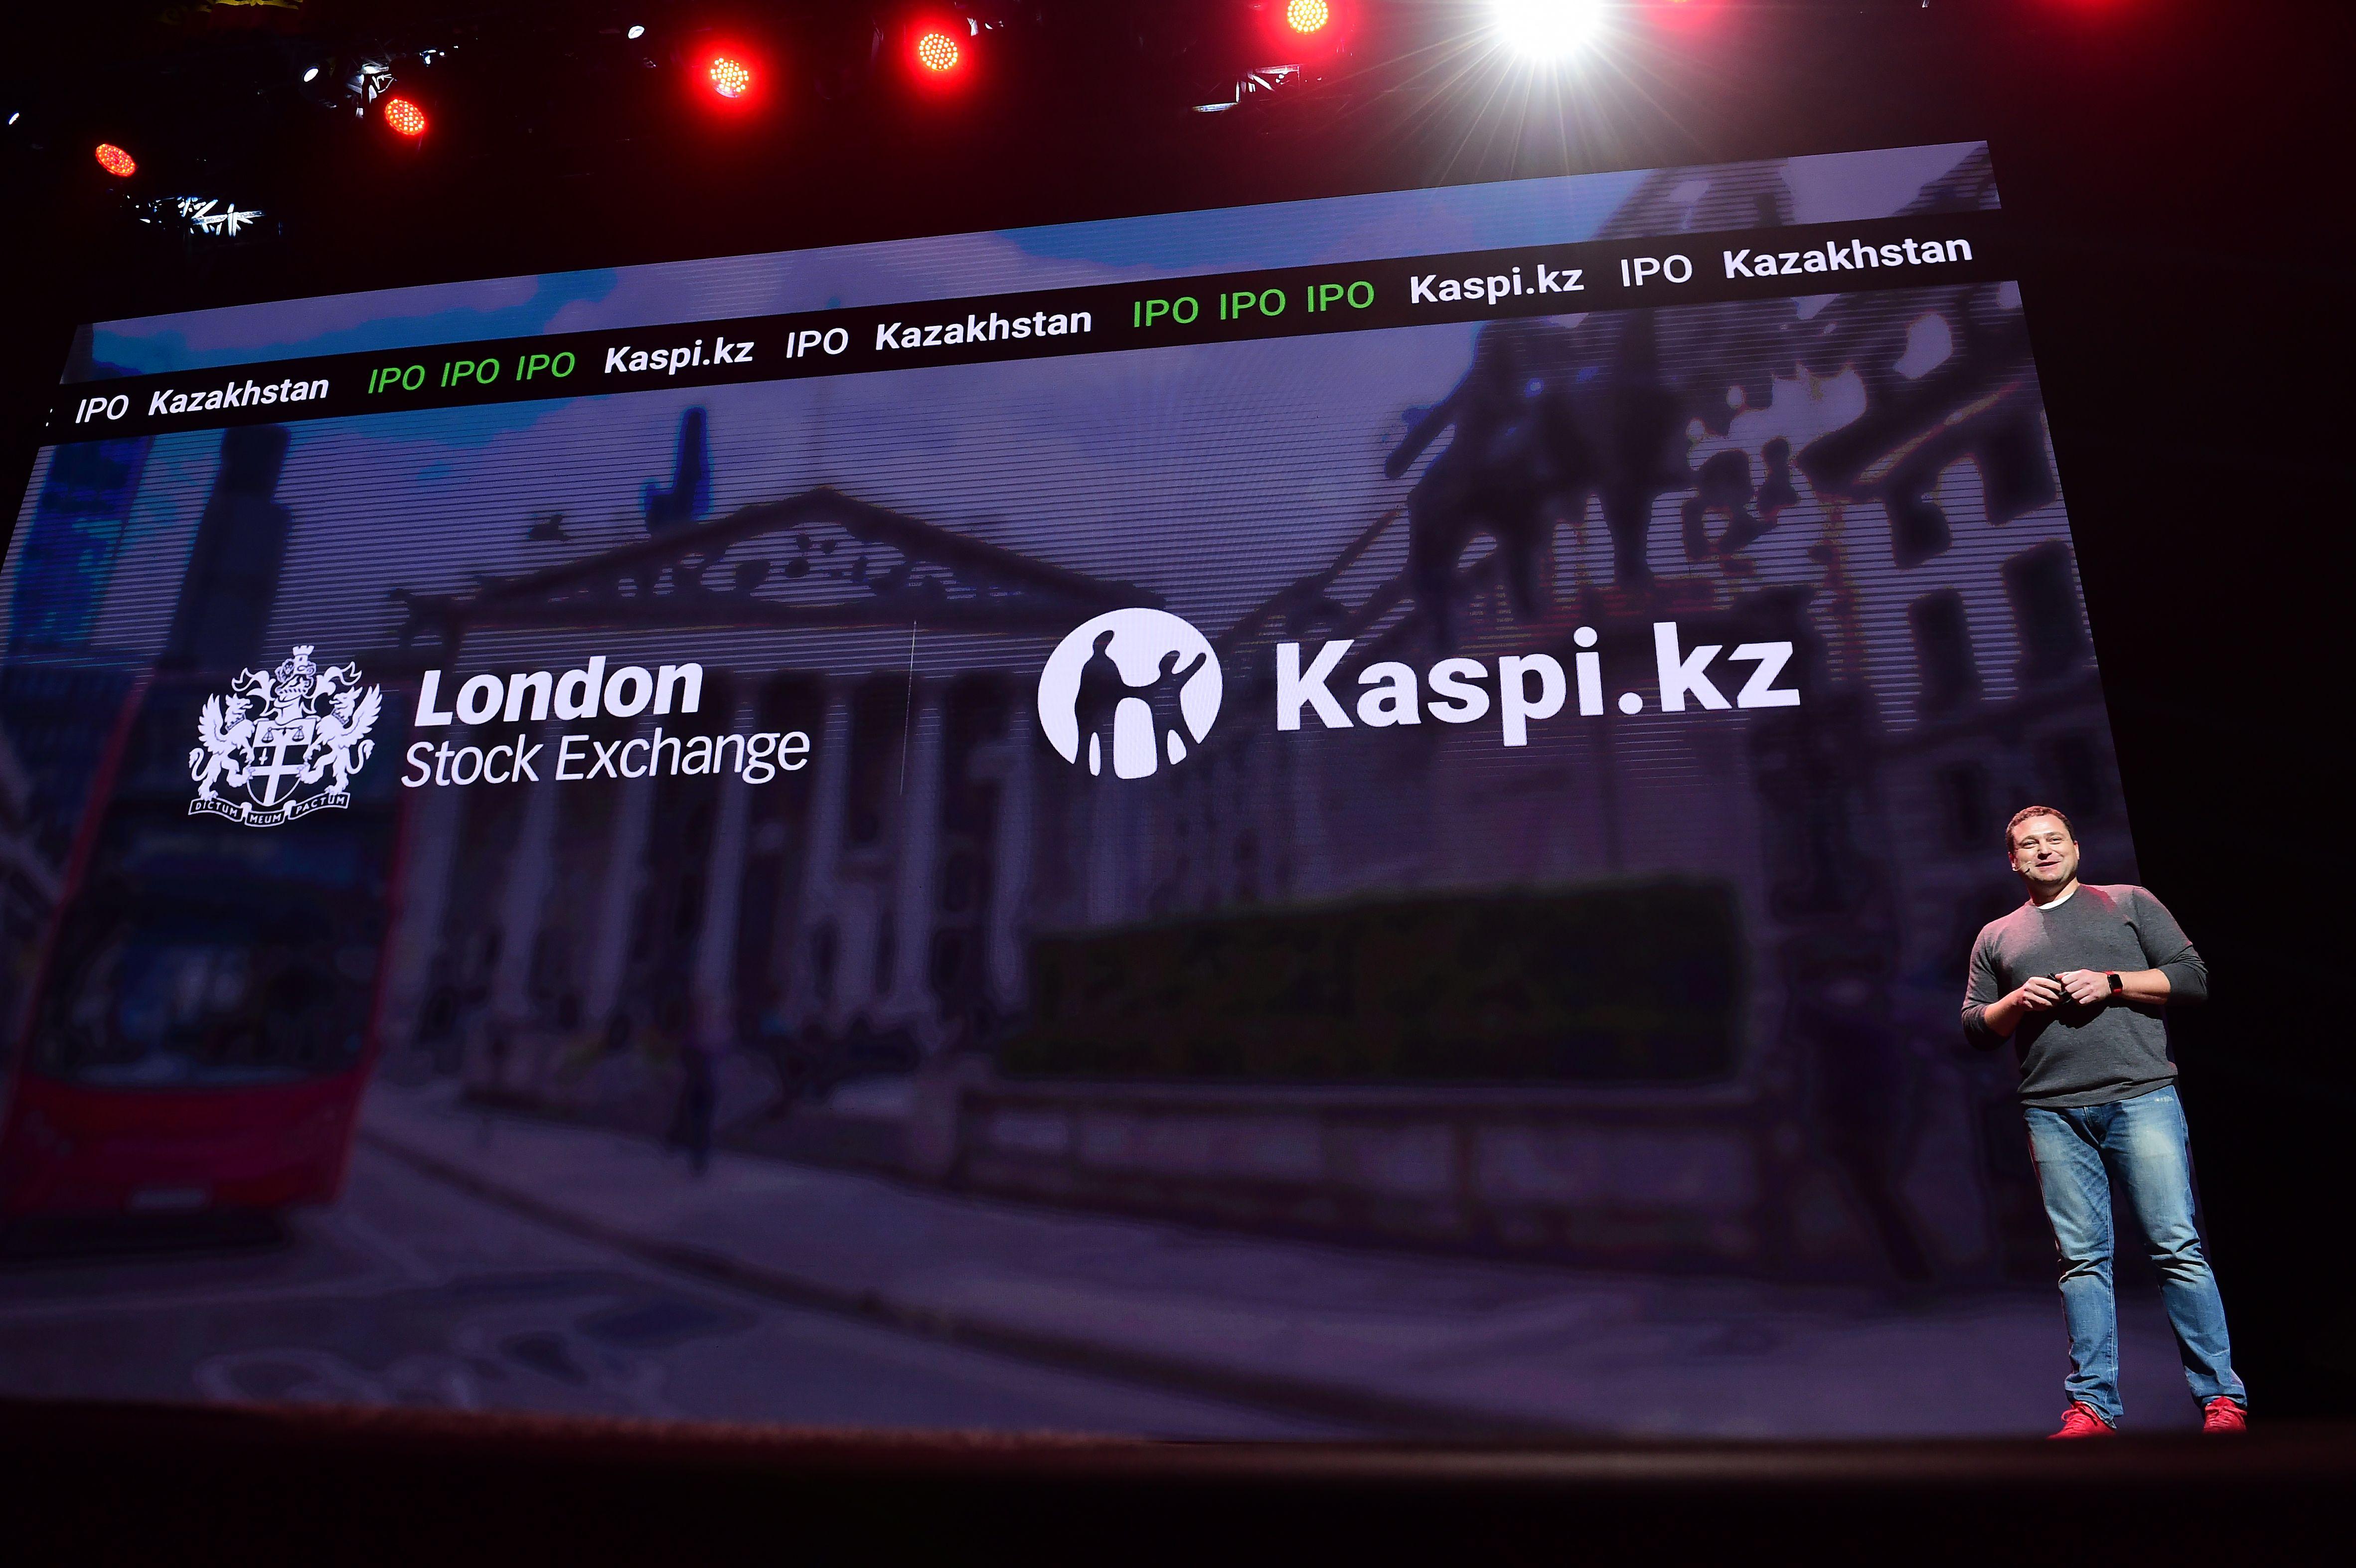 Компания Kaspi.kz объявила об успешном проведении IPO - Kapital.kz